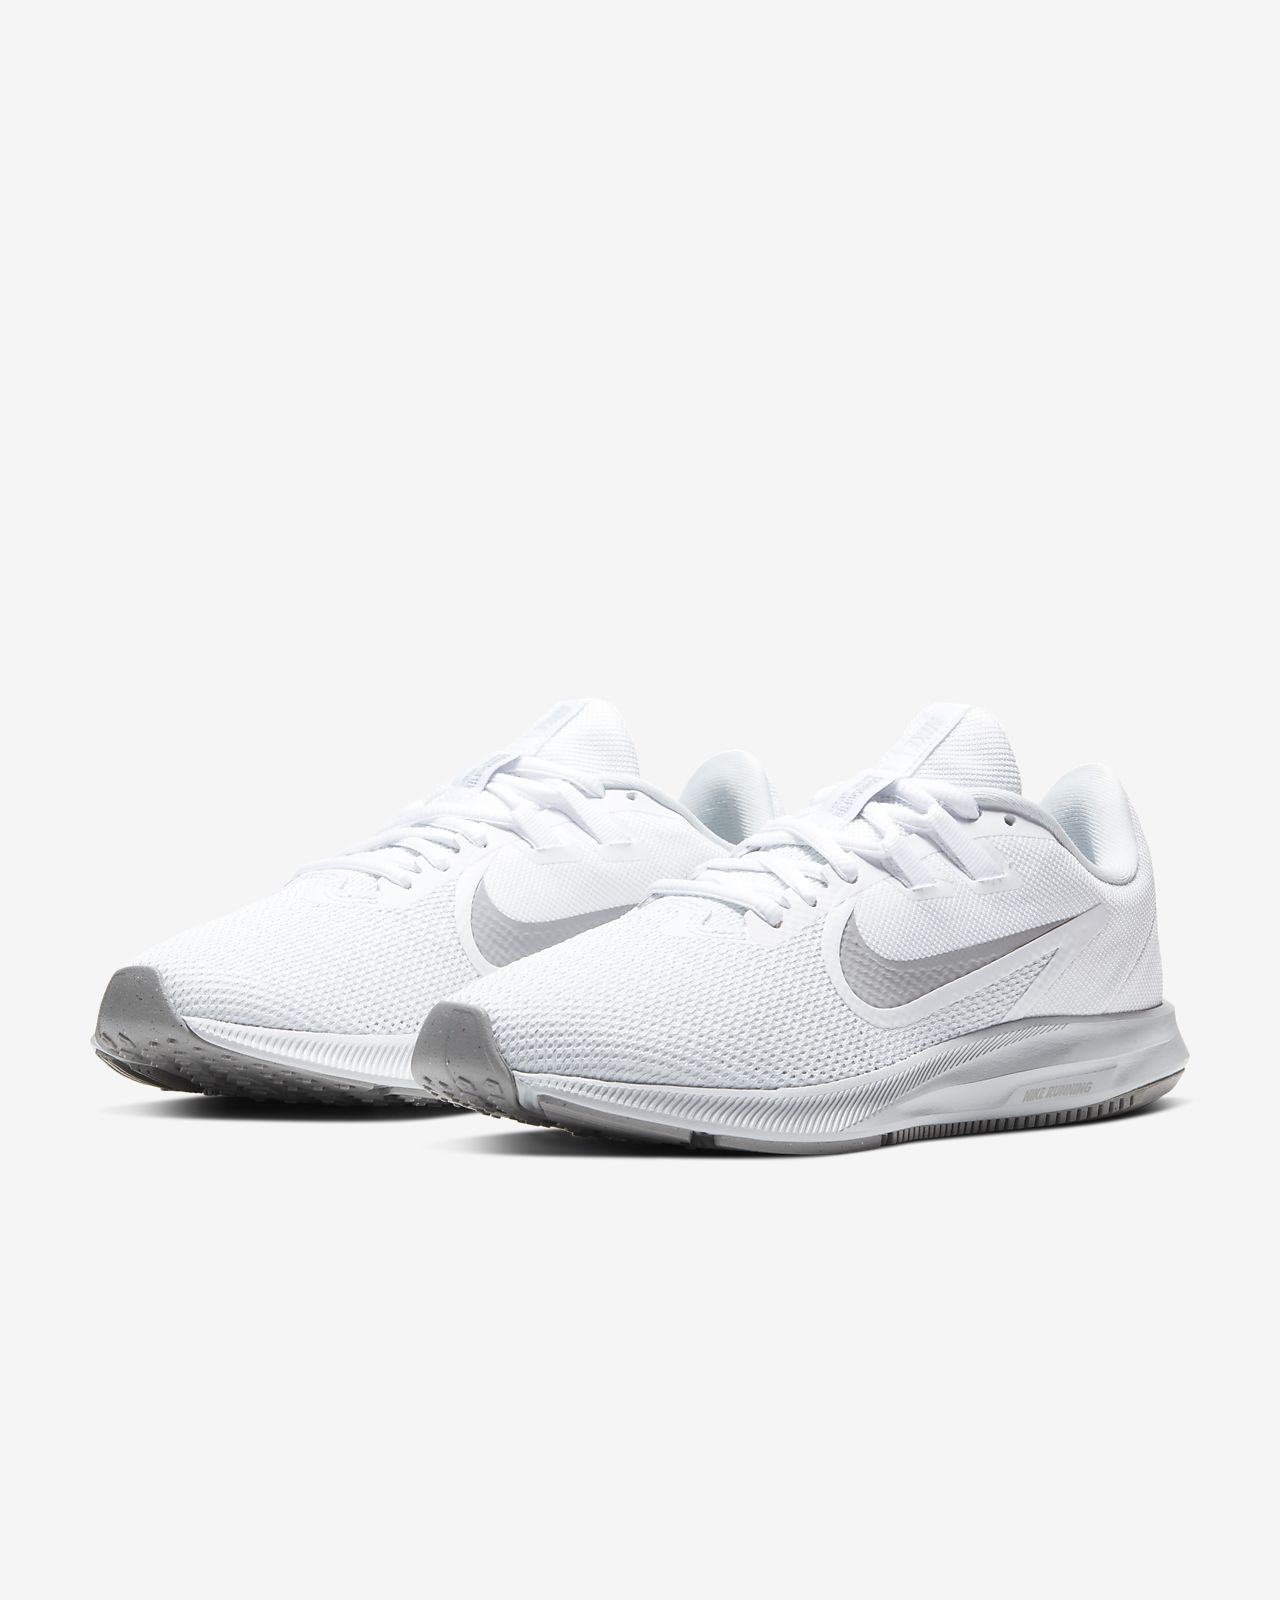 Nike Mens Free Trainer 7 0 9 M US Cool Grey Pure Platinum